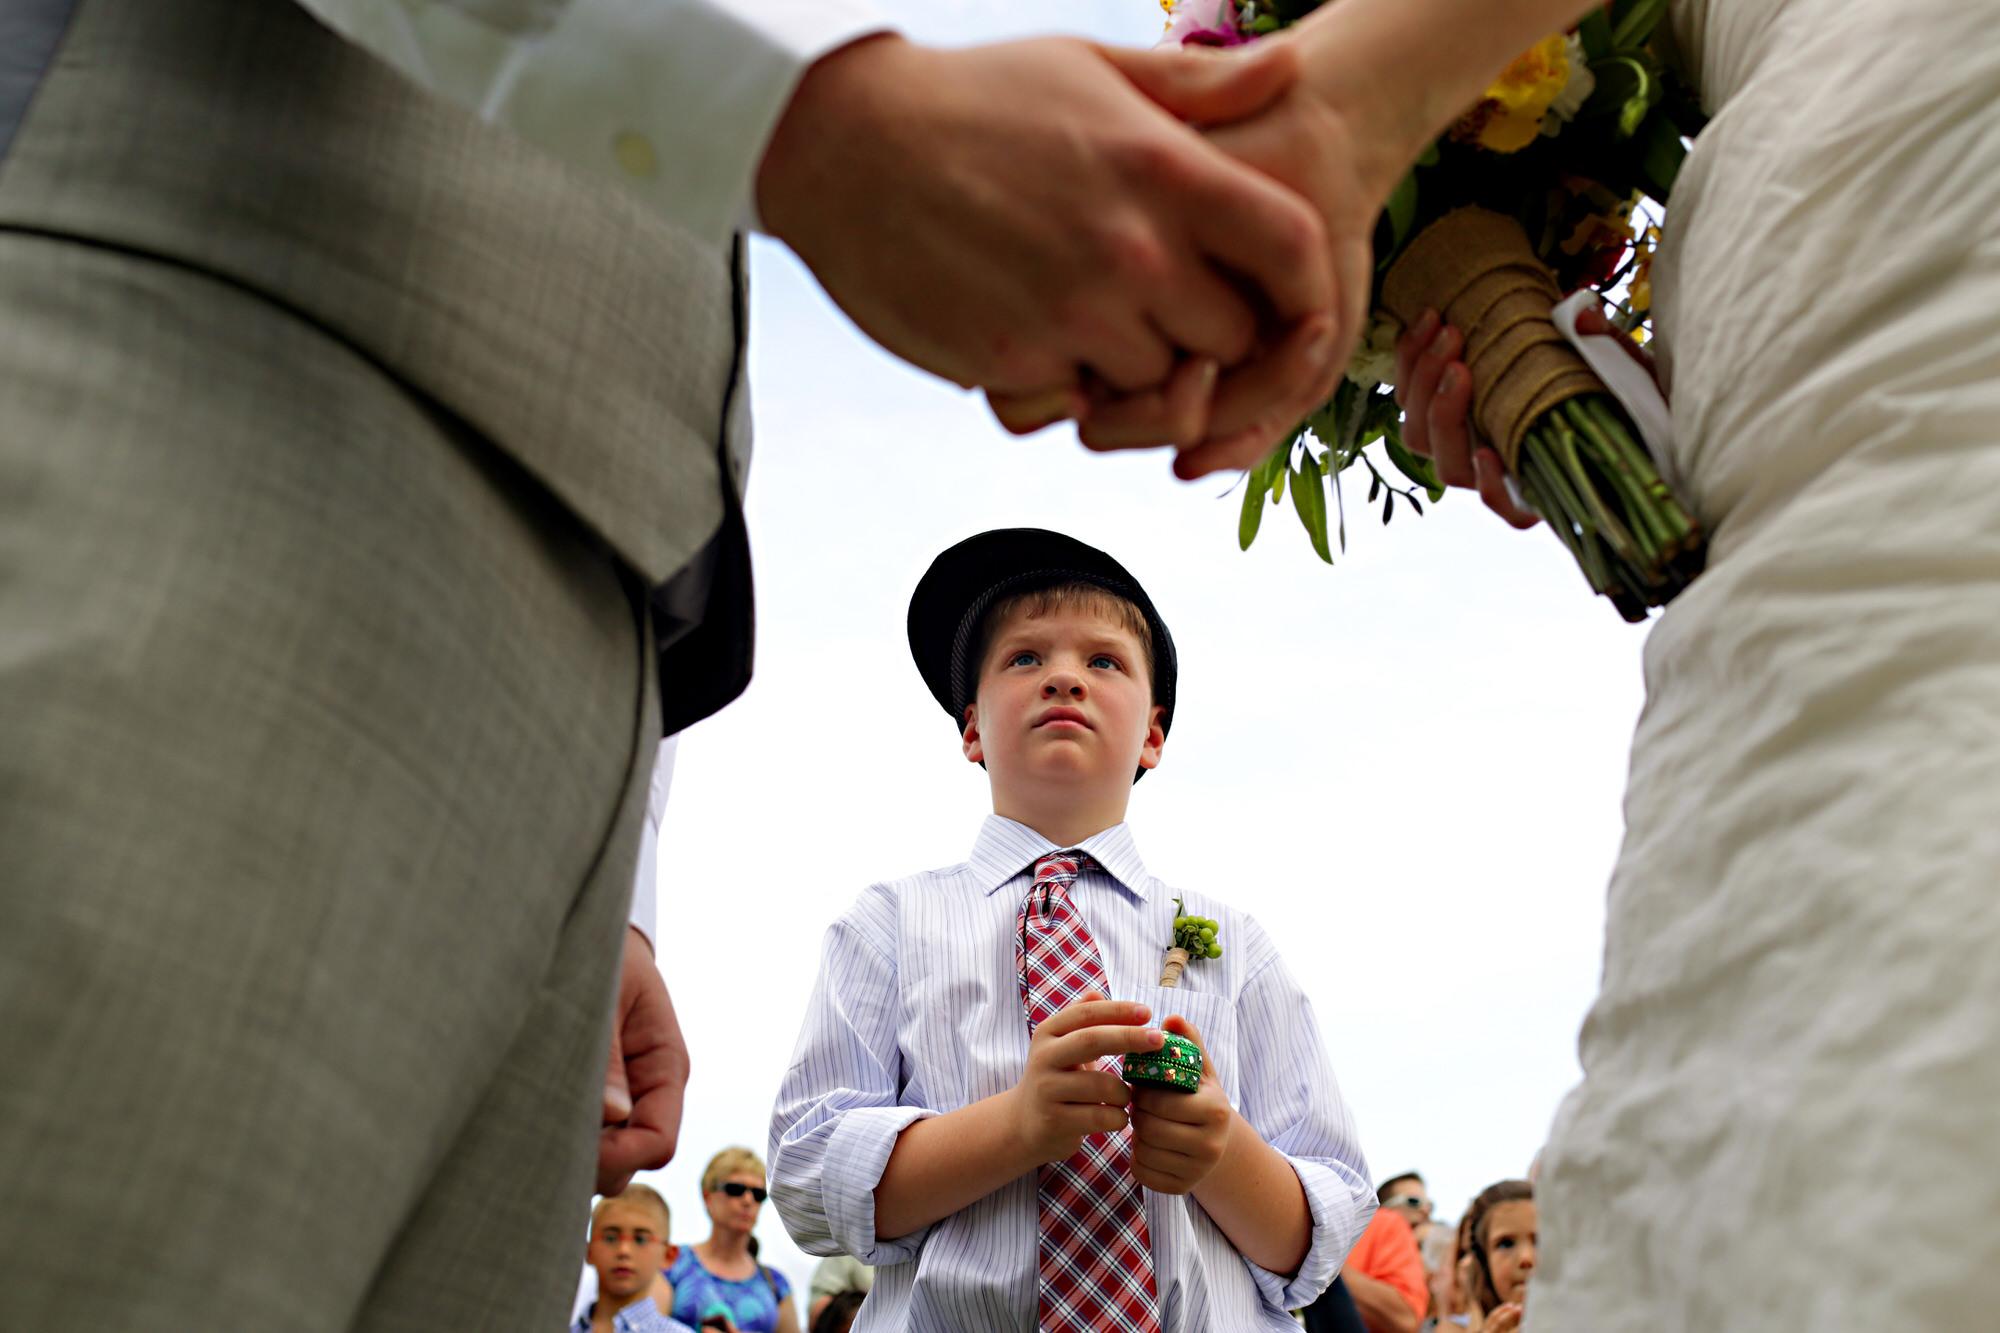 cute-ringbearer-during-wedding-ceremony-framed-by-bride-and-groom-worlds-best-wedding-photos-tyler-wirken-kansas-city-wedding-photographers